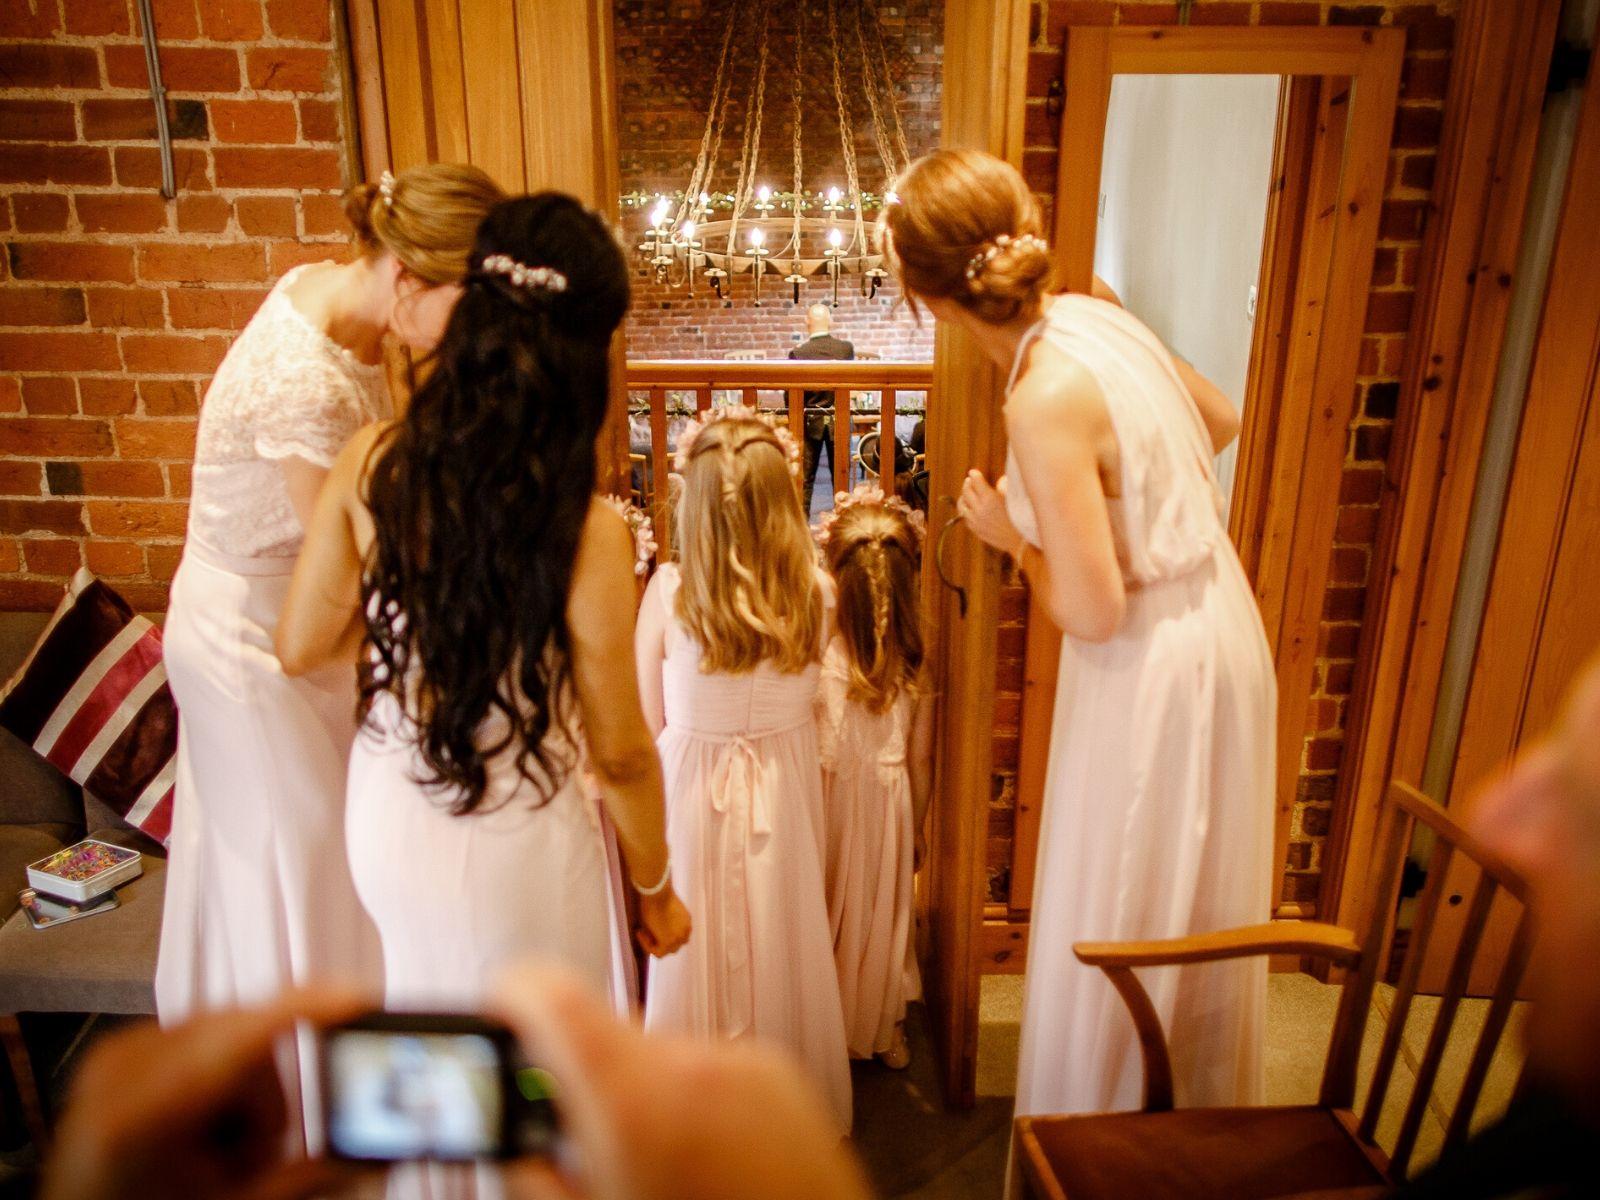 Wedding venue in Stratford Upon Avon